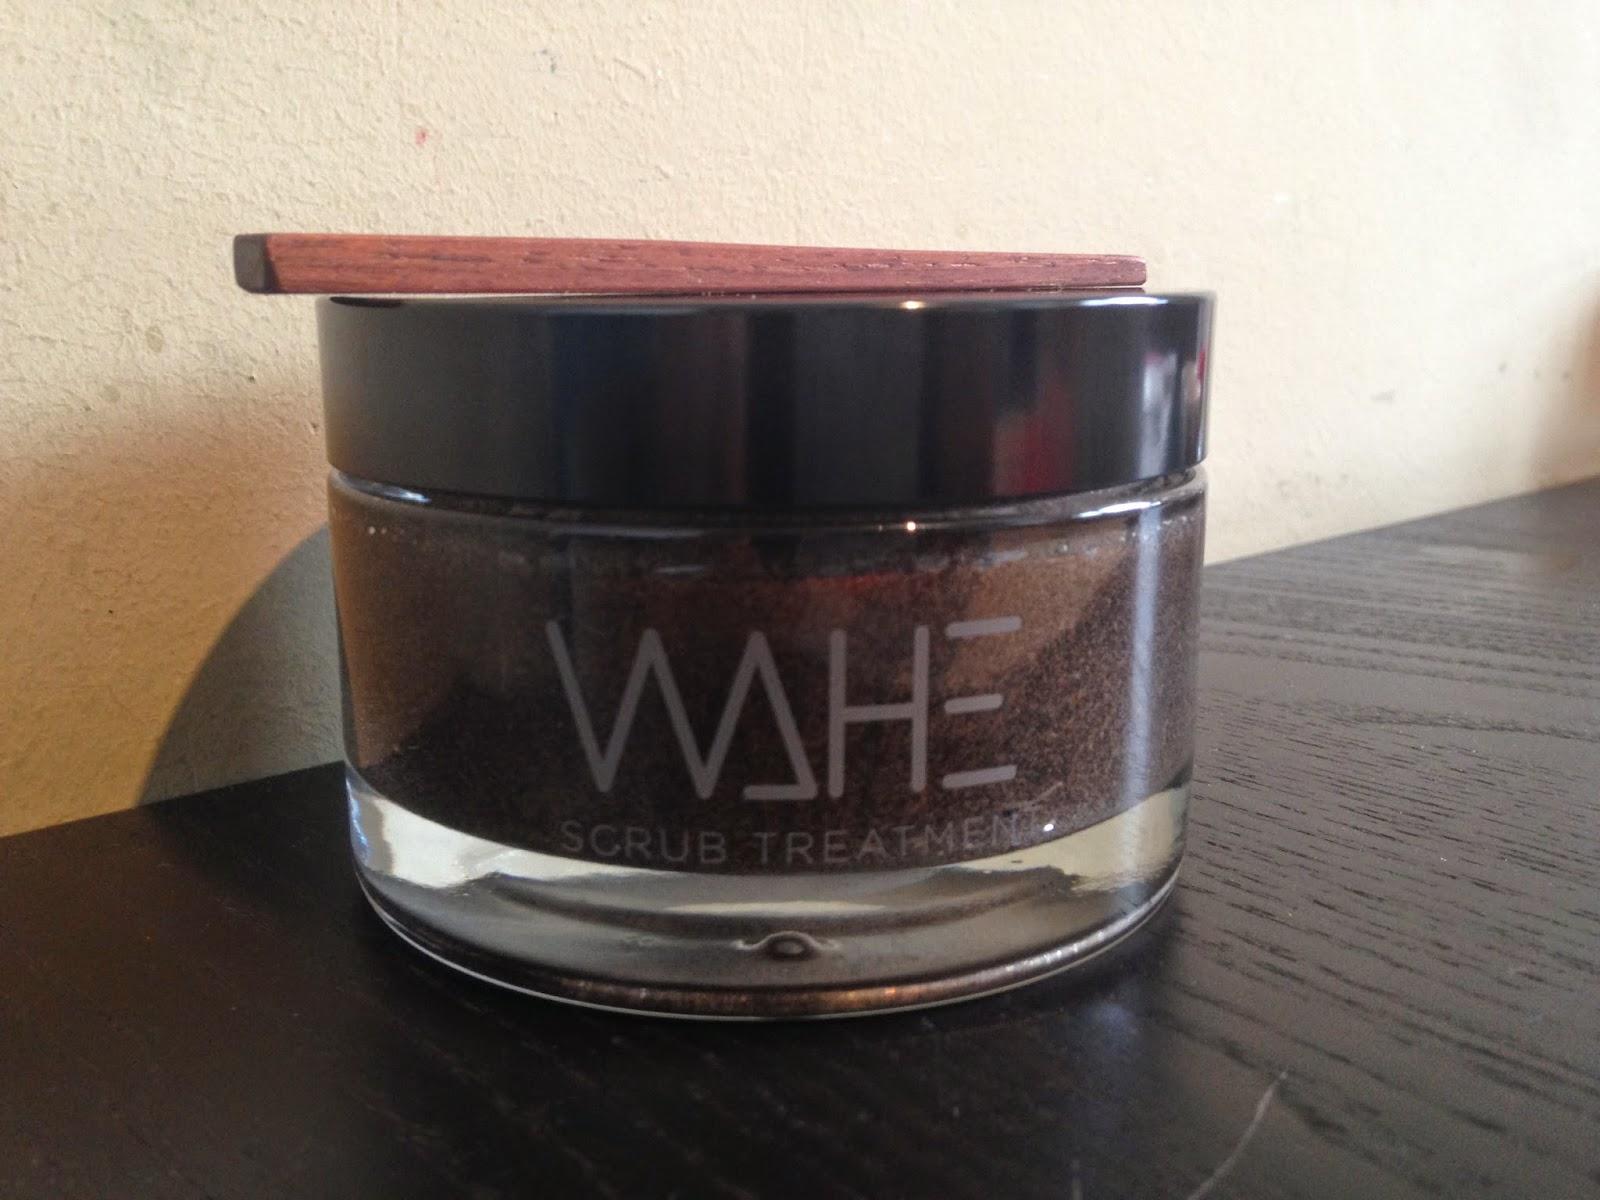 Vegane Kosmetik von WAHE